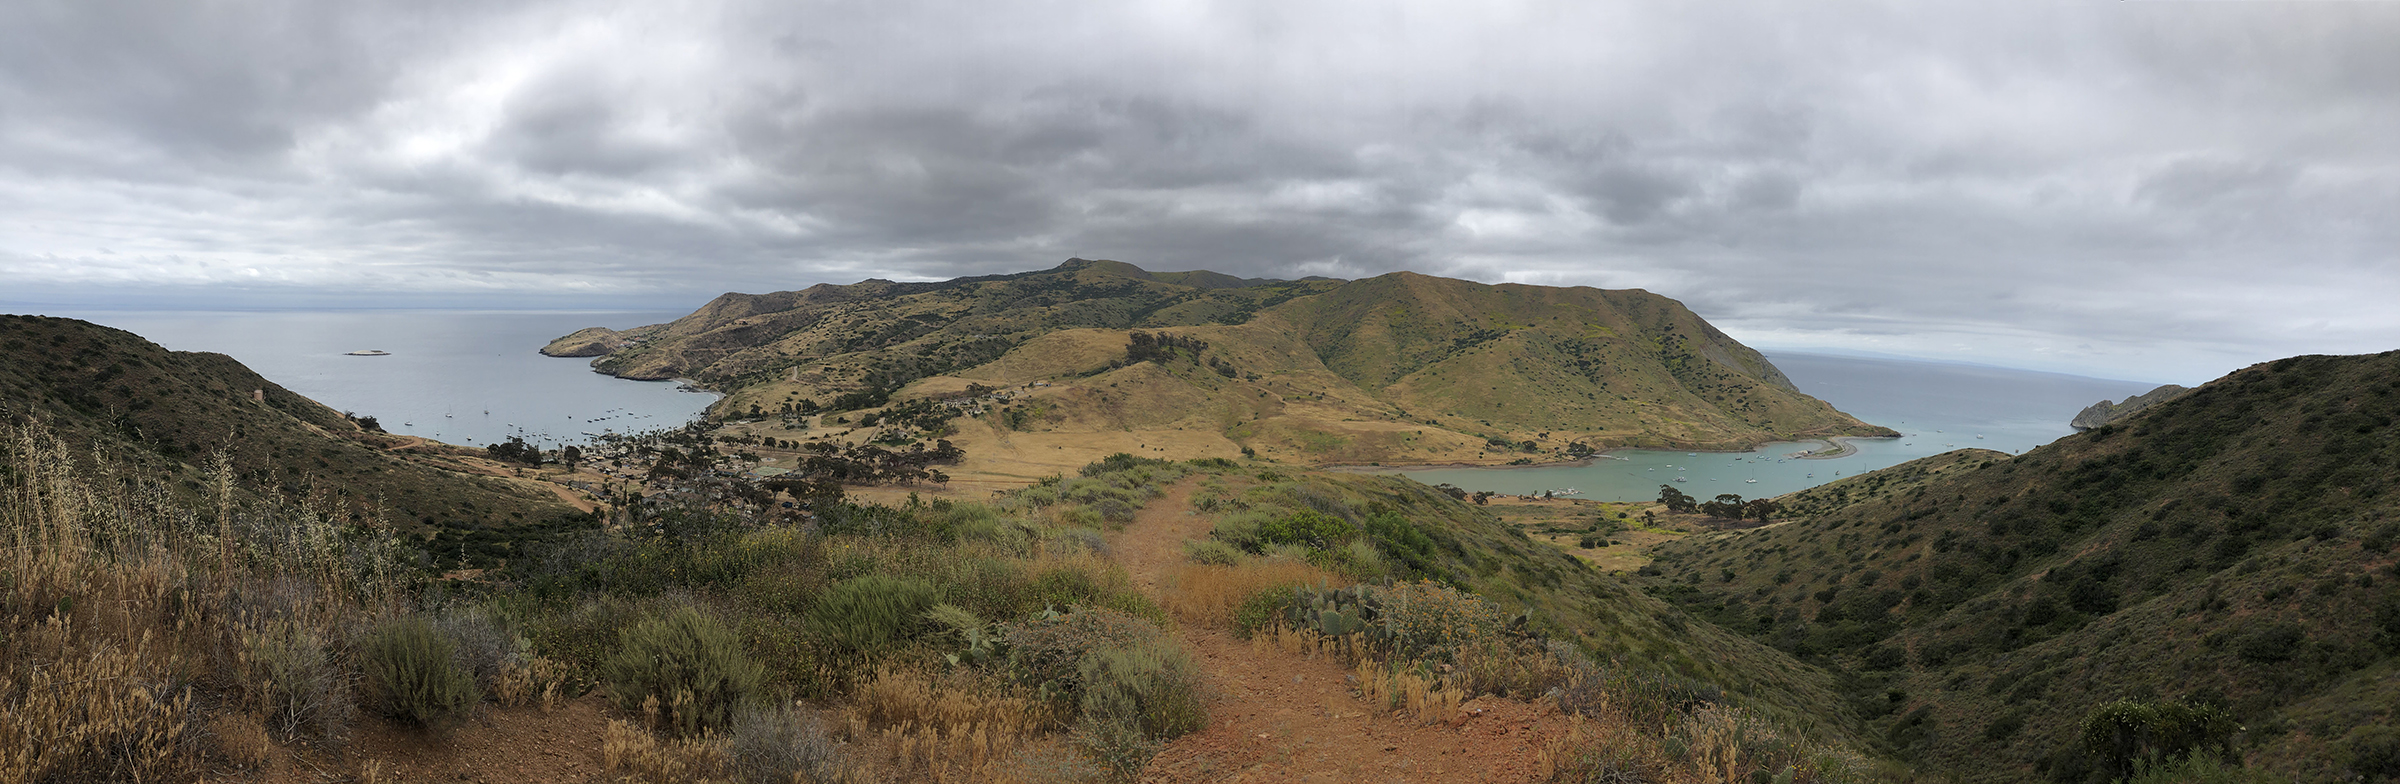 Trans-Catalina Trail-0837.jpg